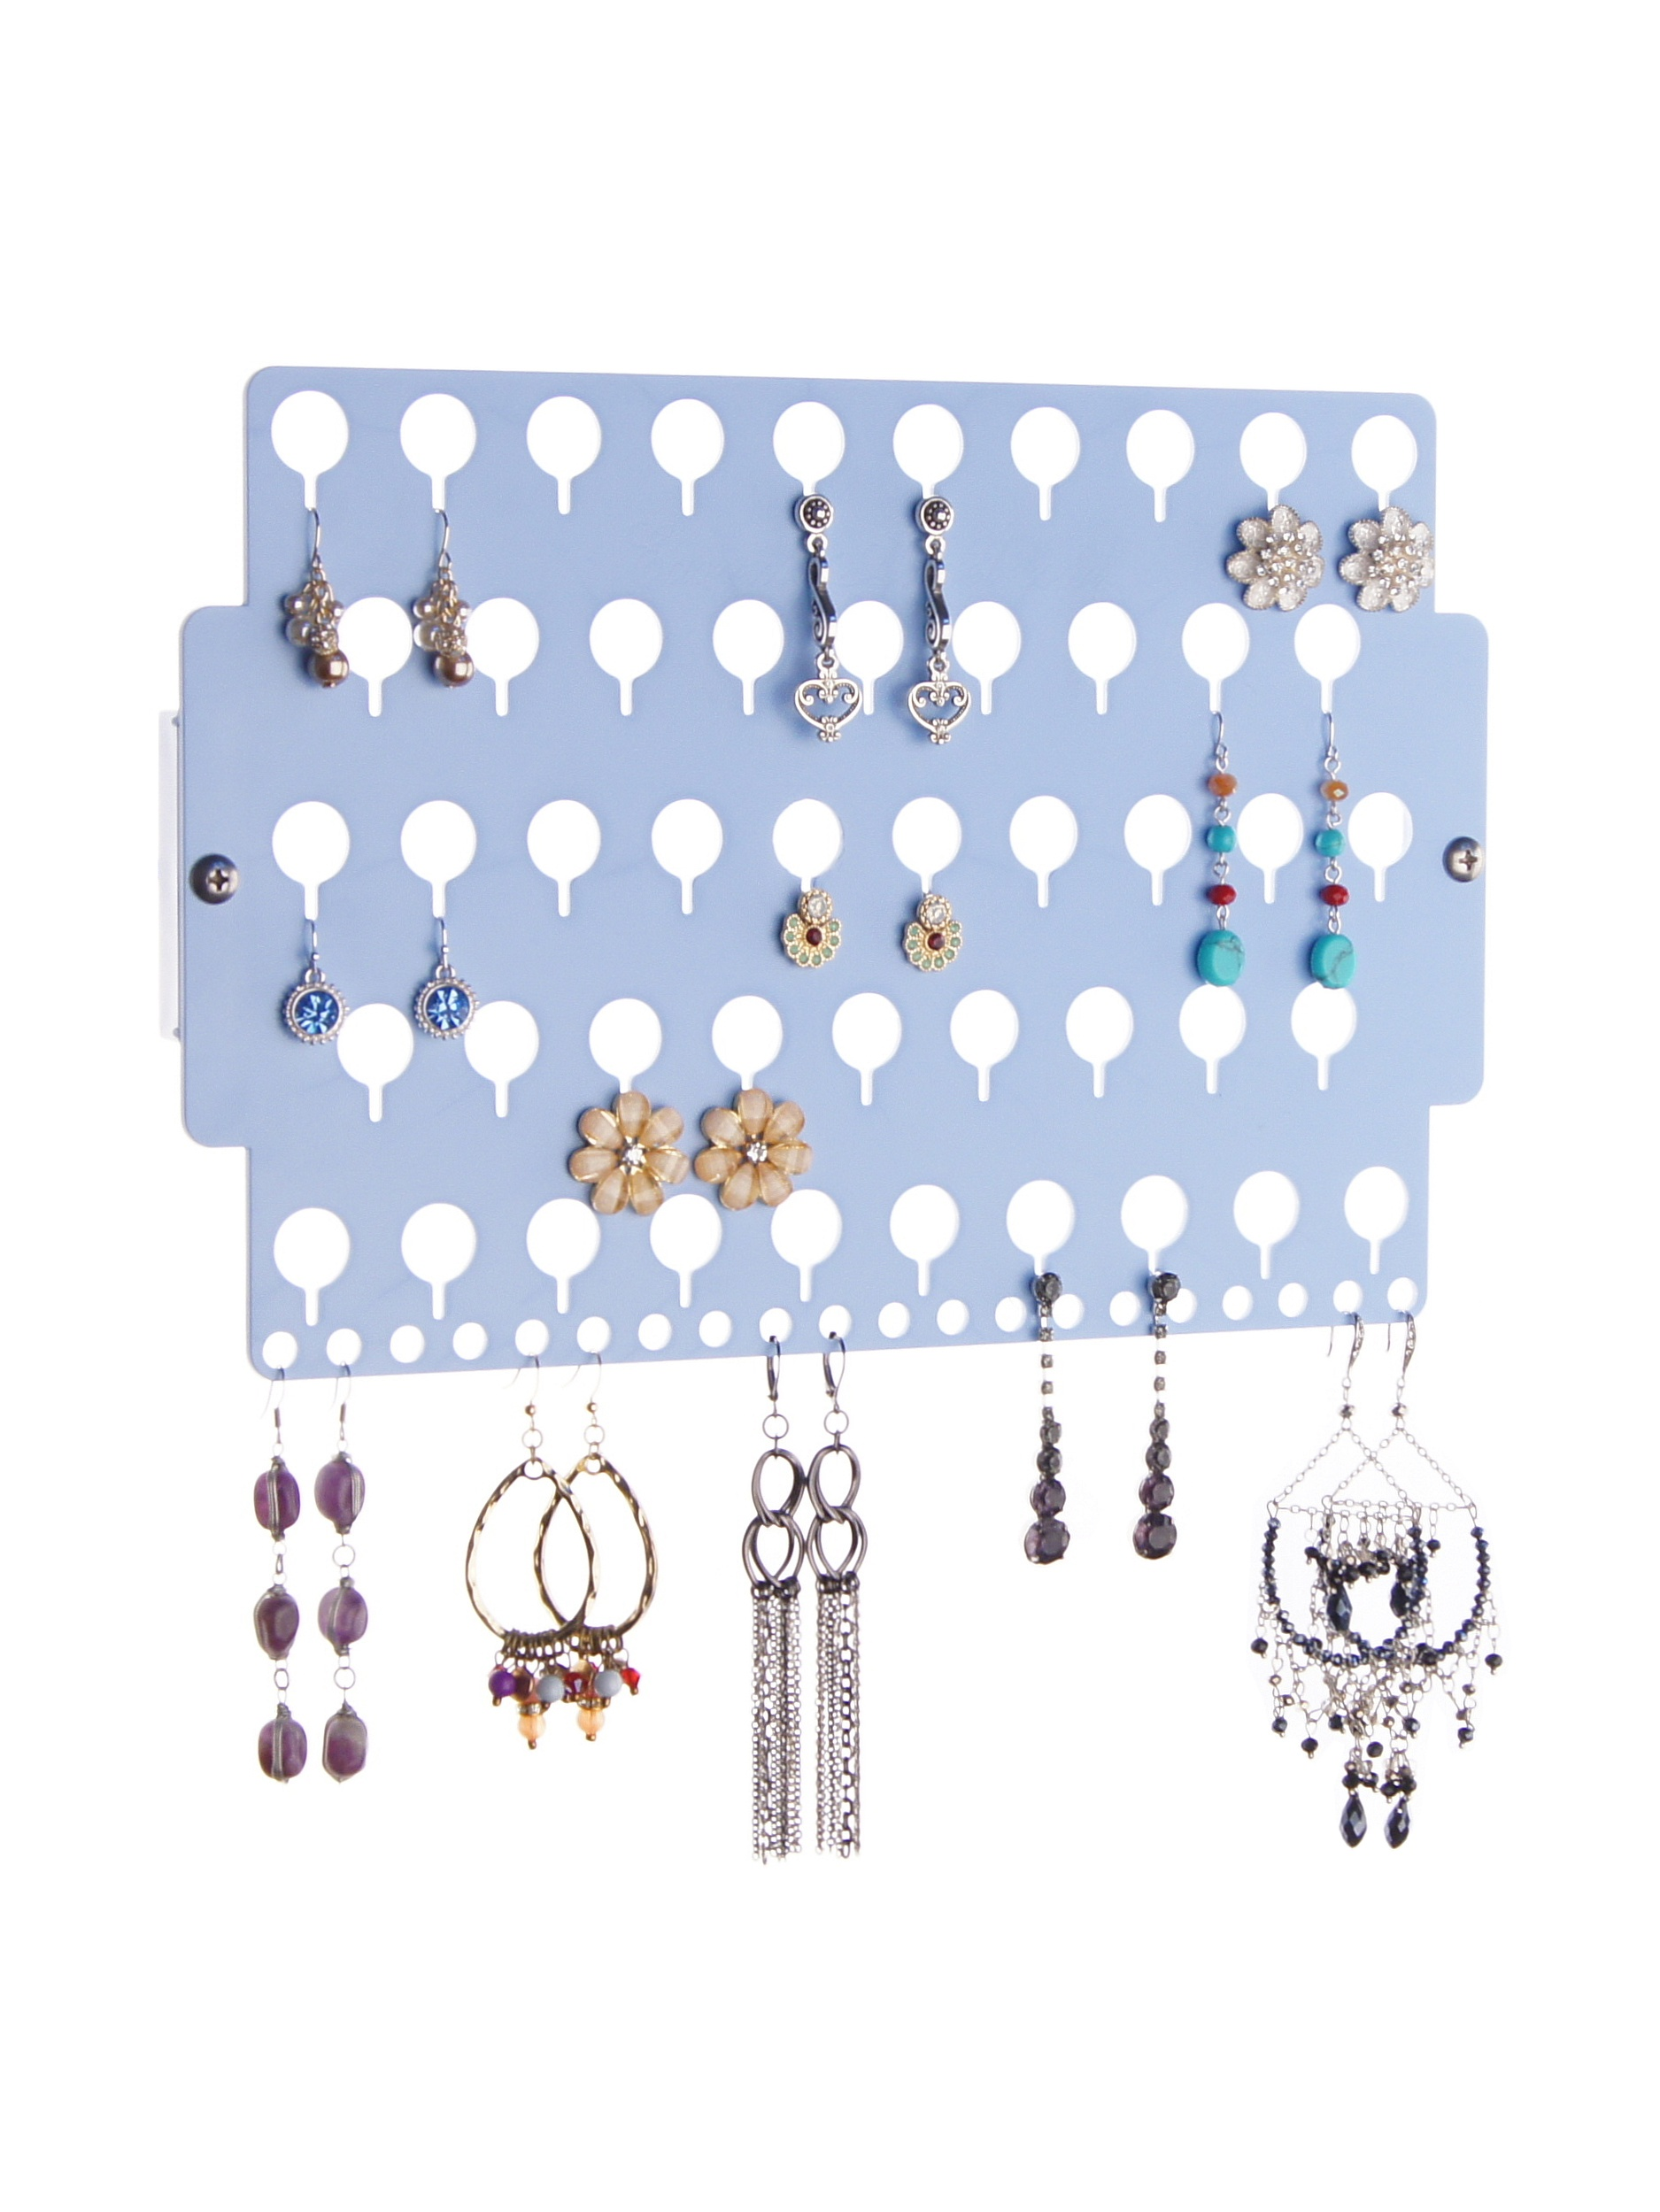 Wall Mount Stud Earring Holder Hanging Jewelry Organizer Rack Closet Storage, Angelynn's Earring Angel White